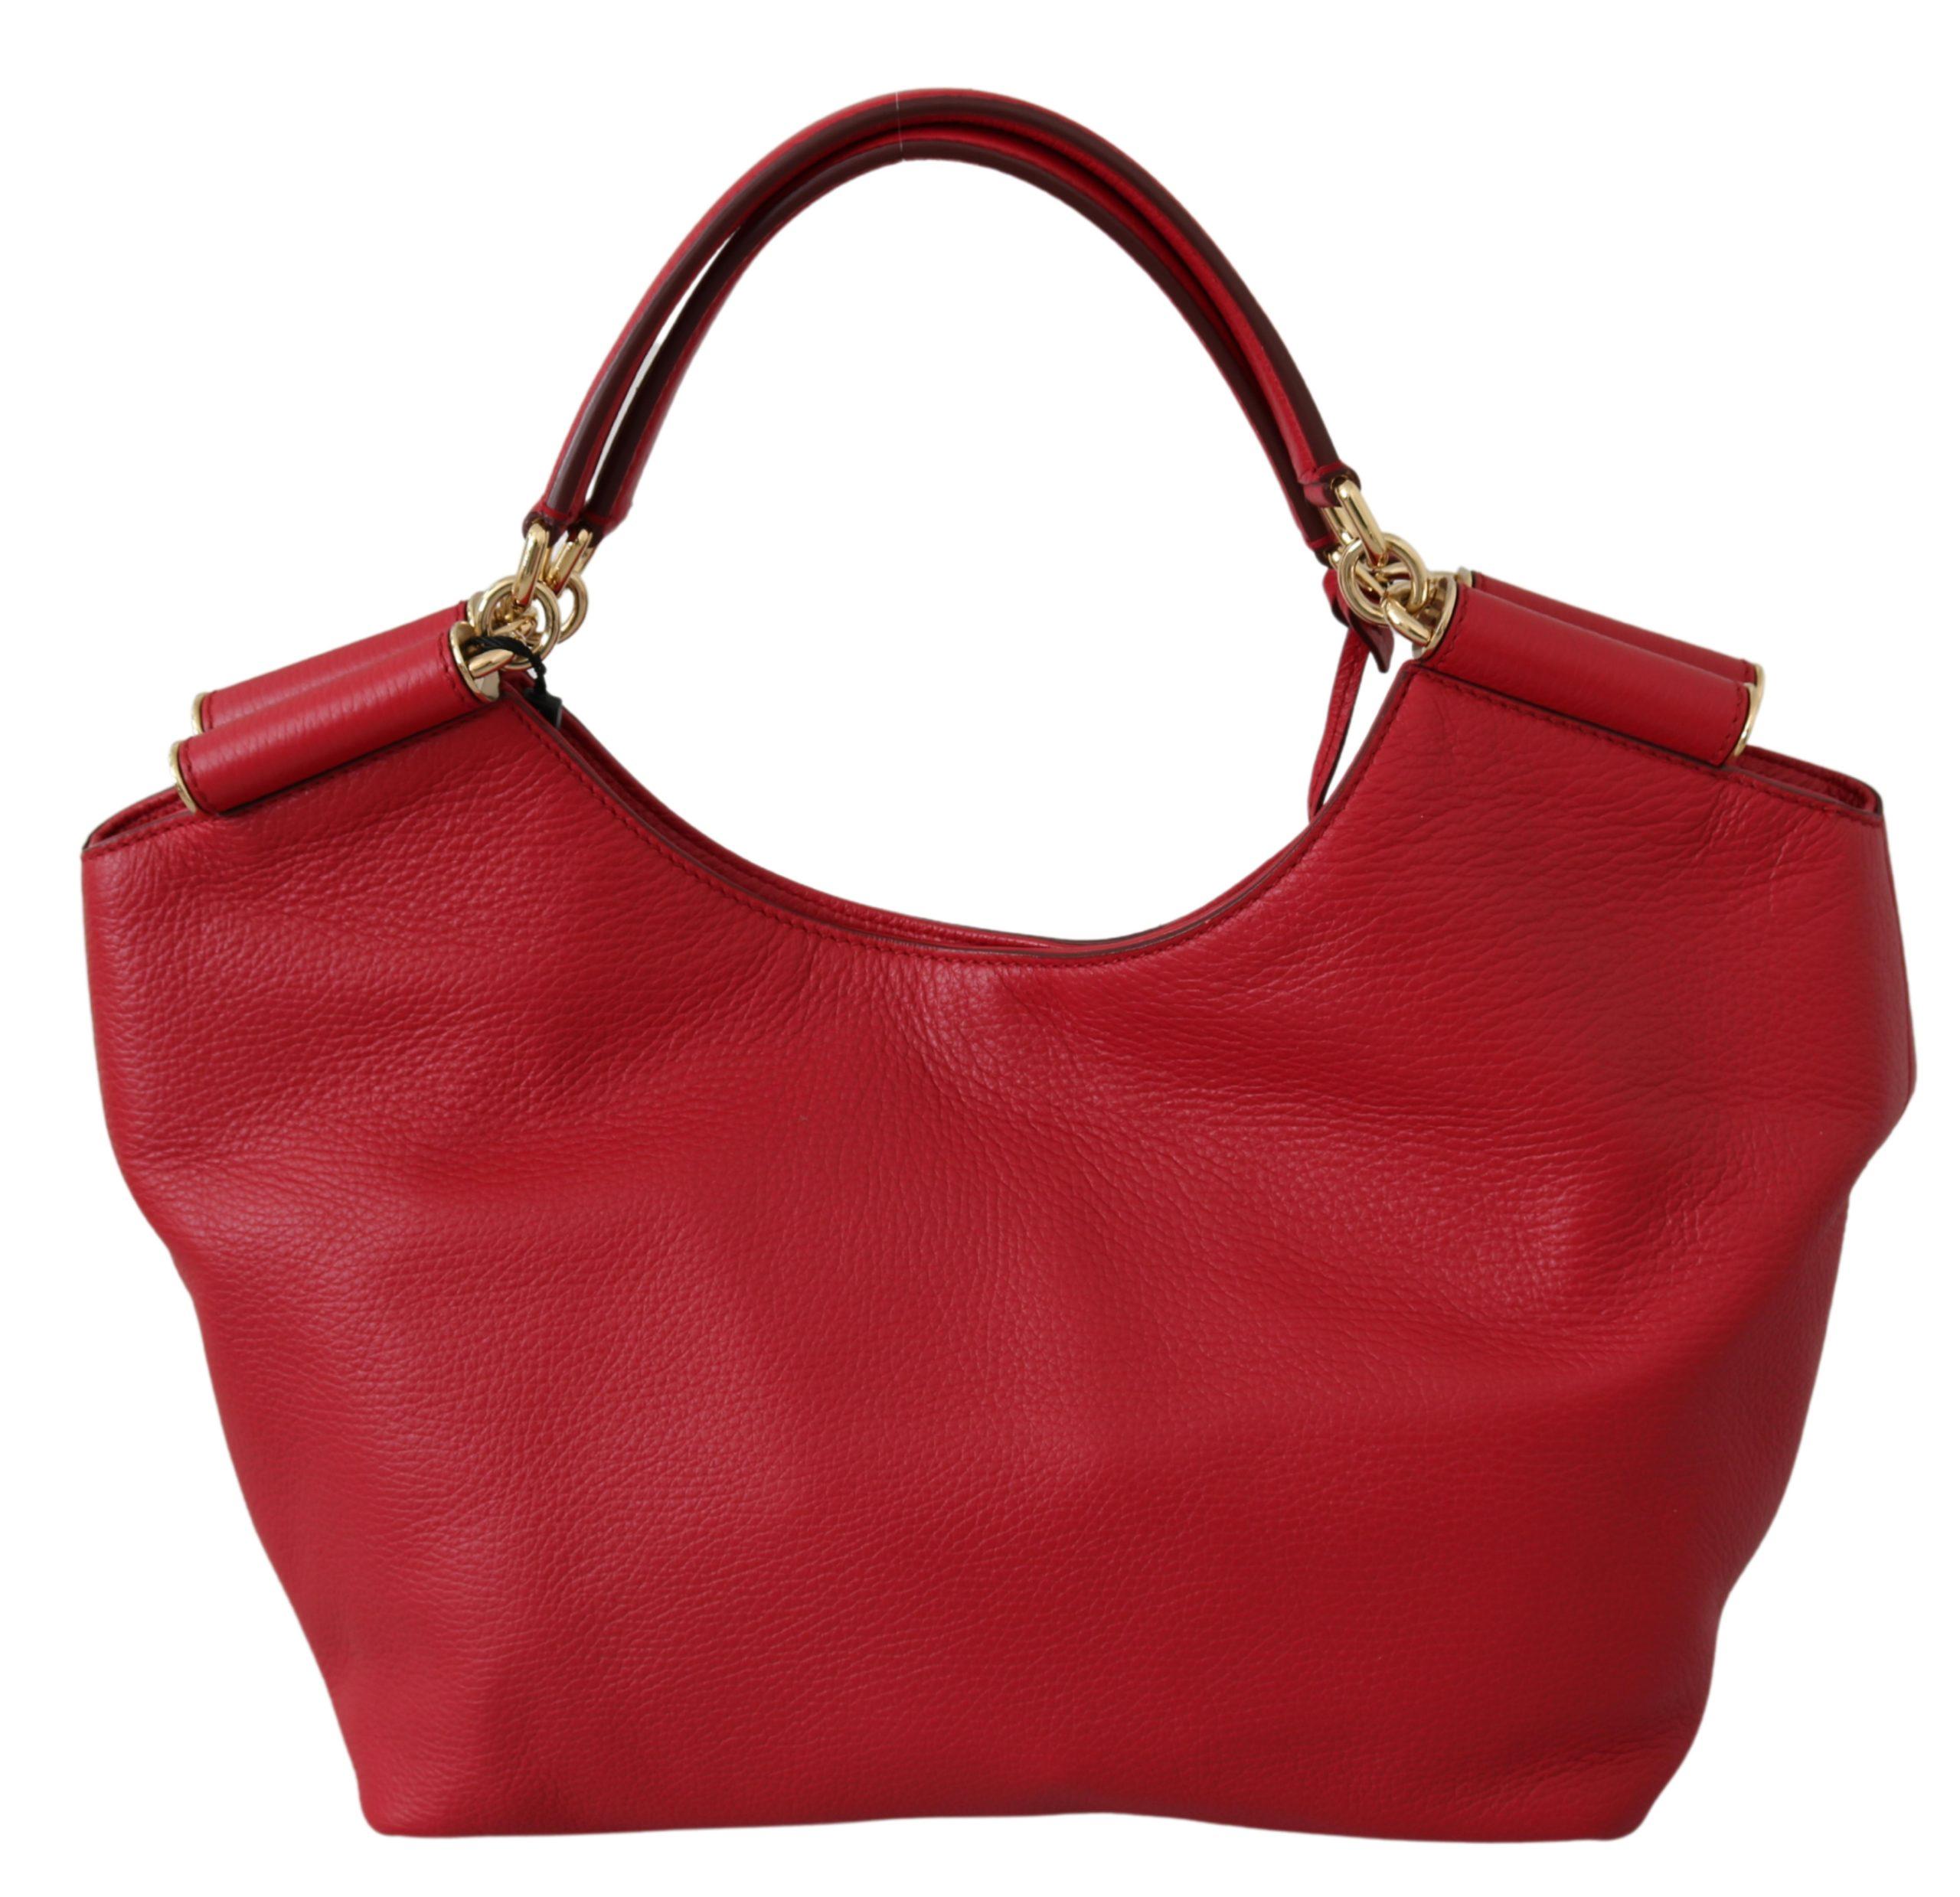 Dolce & Gabbana Women's Handbag SICILY Leather Tote Bag Red VAS9588